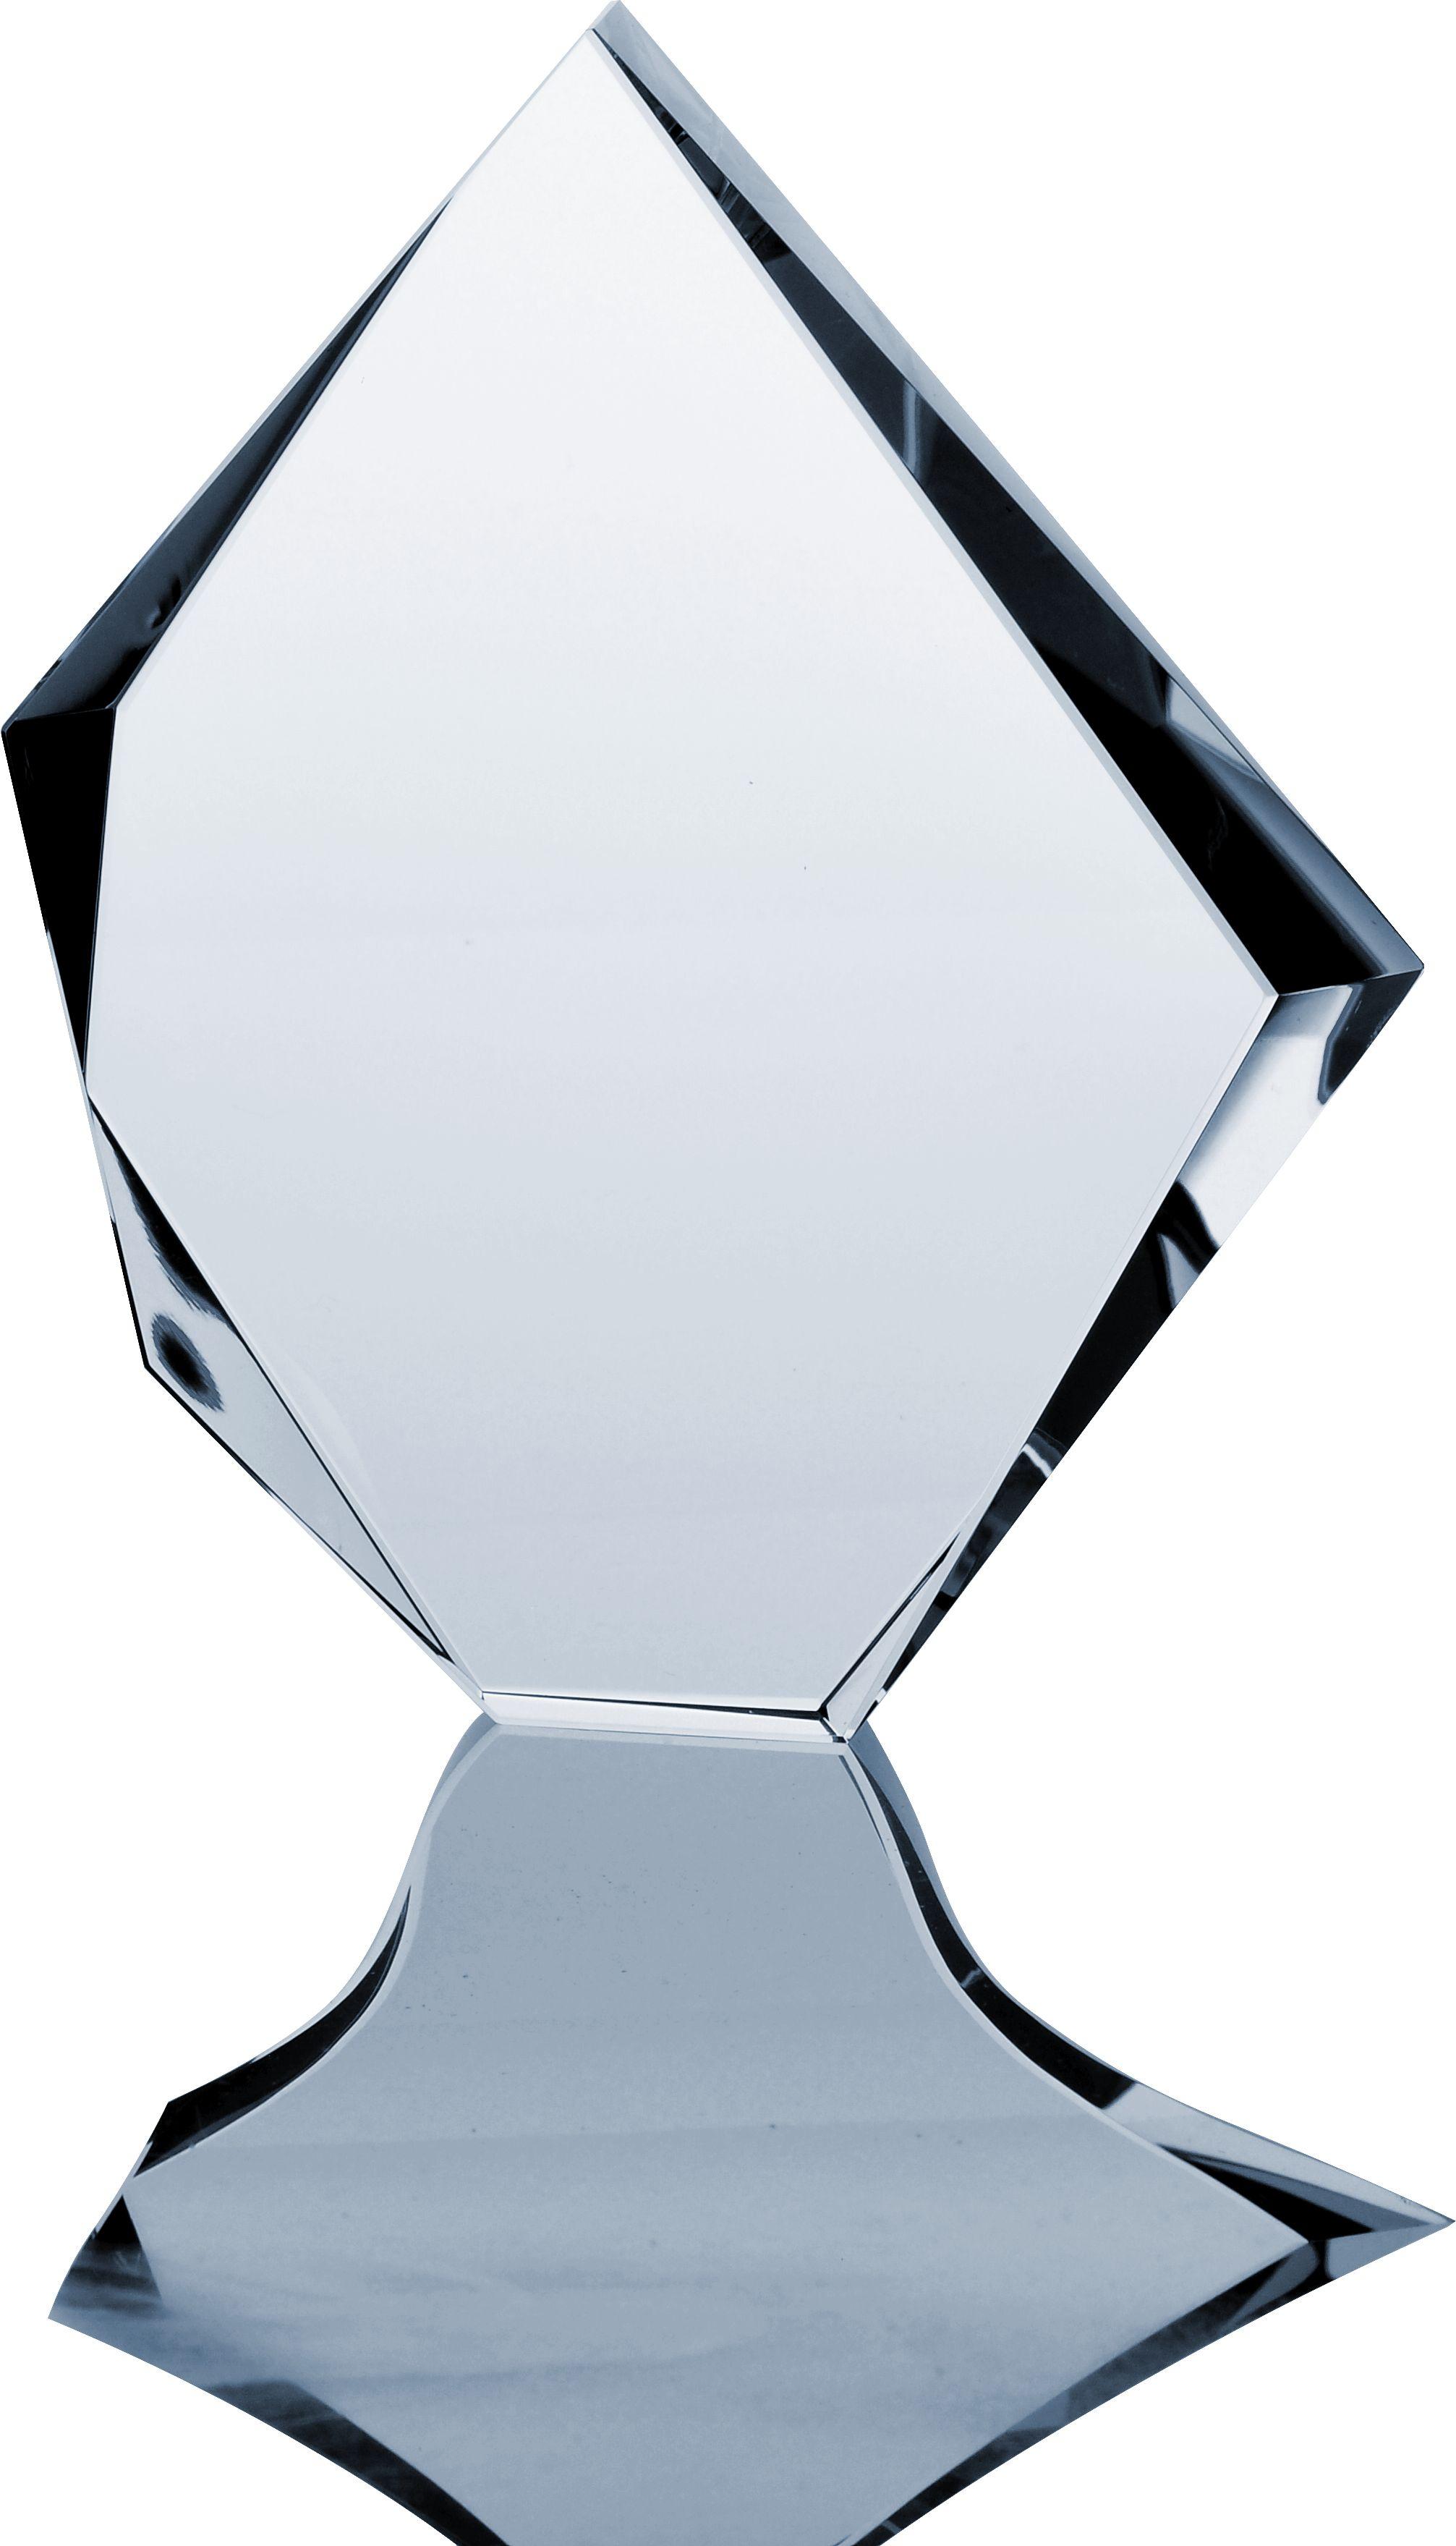 Szklana statuetka C036